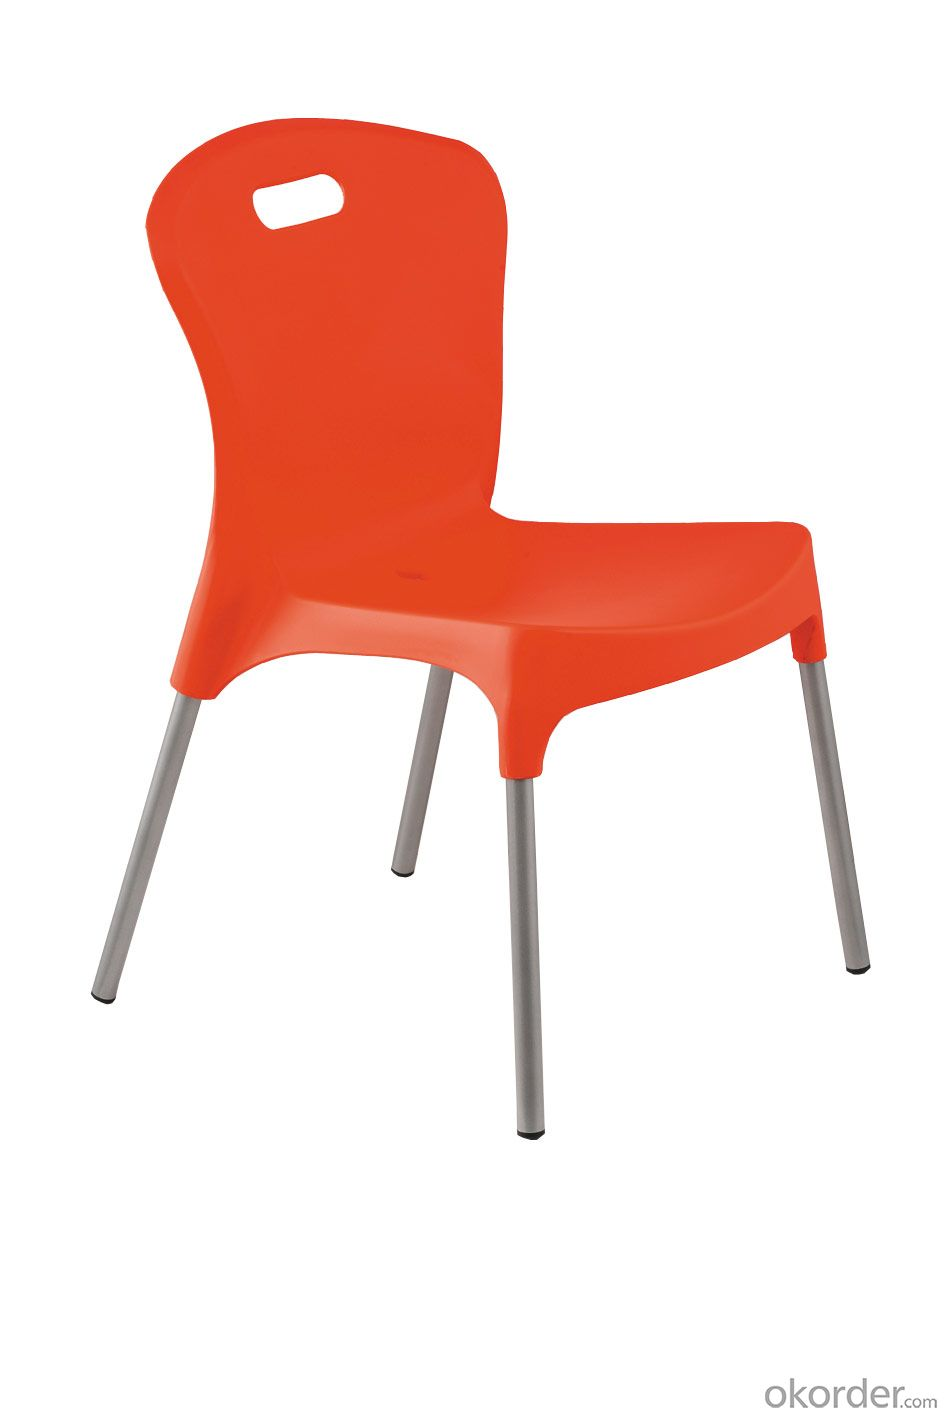 Outdoor restaurant plastic dining chair